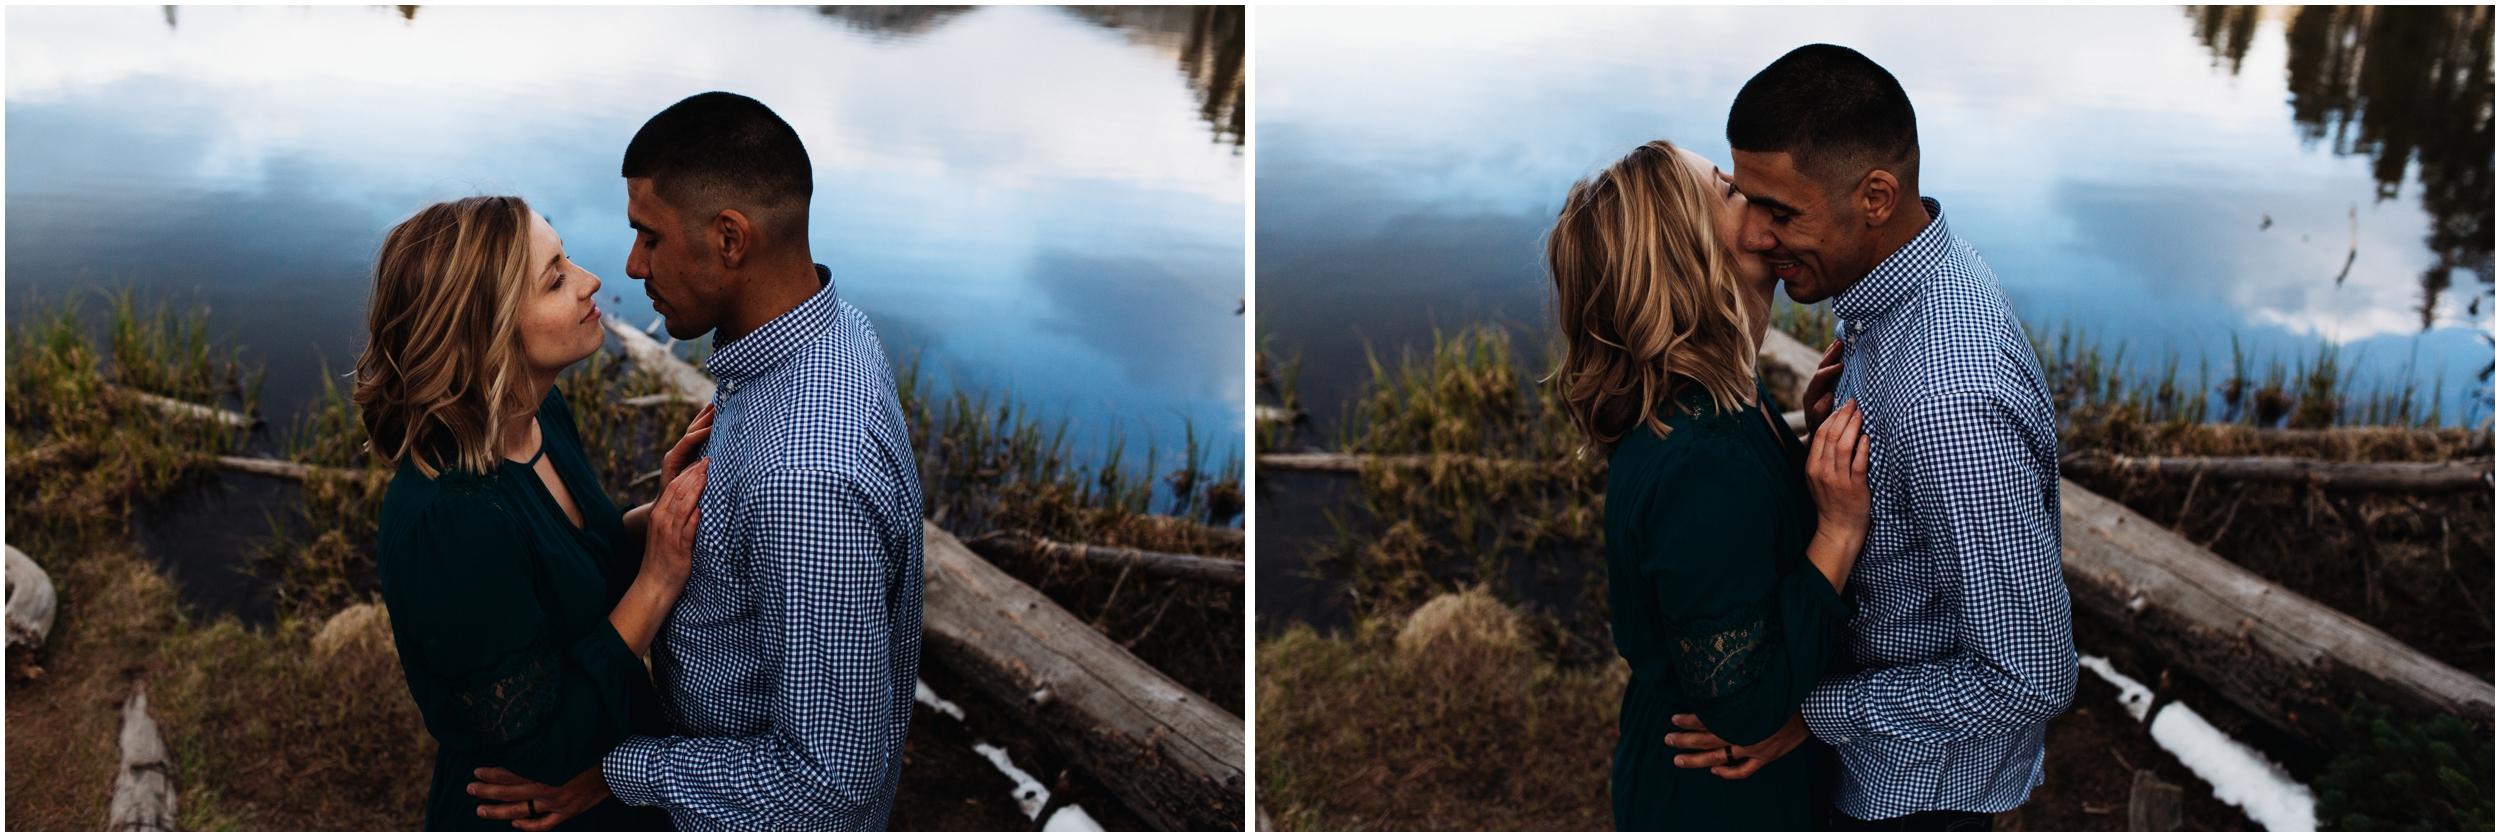 rocky-mountain-national-park-elopement-sprague-lake-colorado-adventure-wedding-photographer_taylor-powers_161.jpg